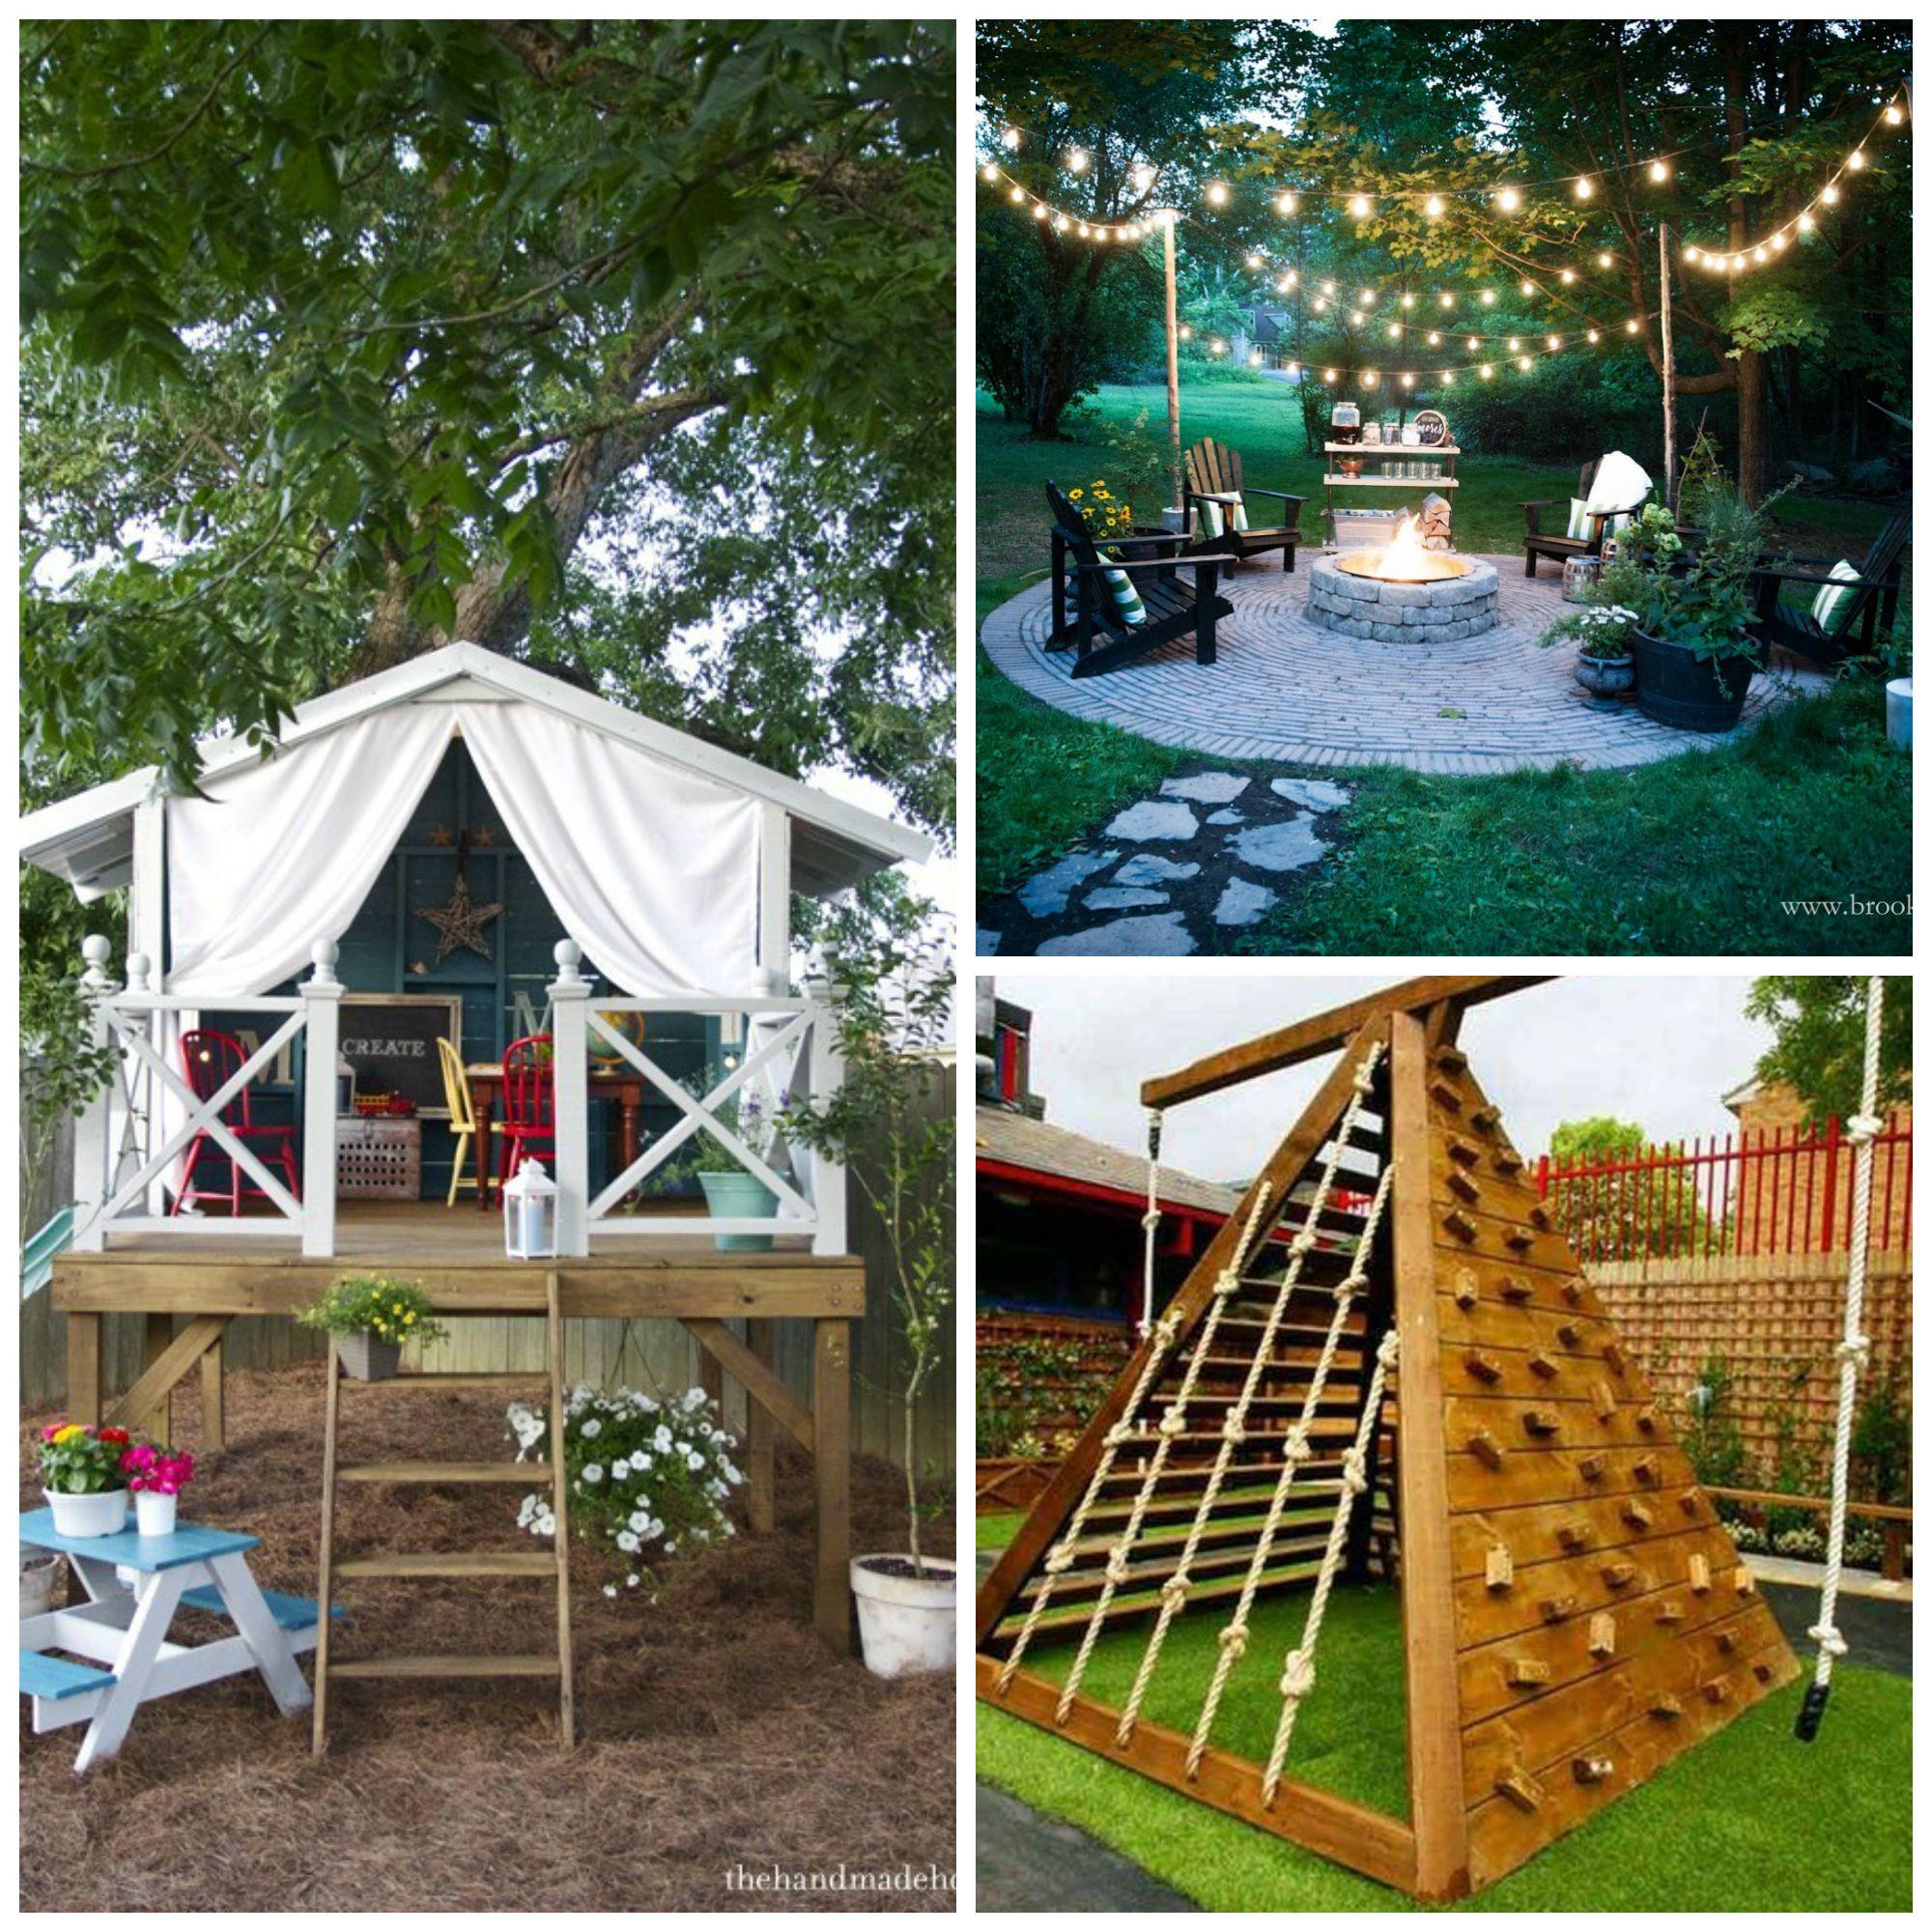 12 Great Ideas For A Modest Backyard: 12 Fun DIY Backyard Ideas Perfect For Any Season